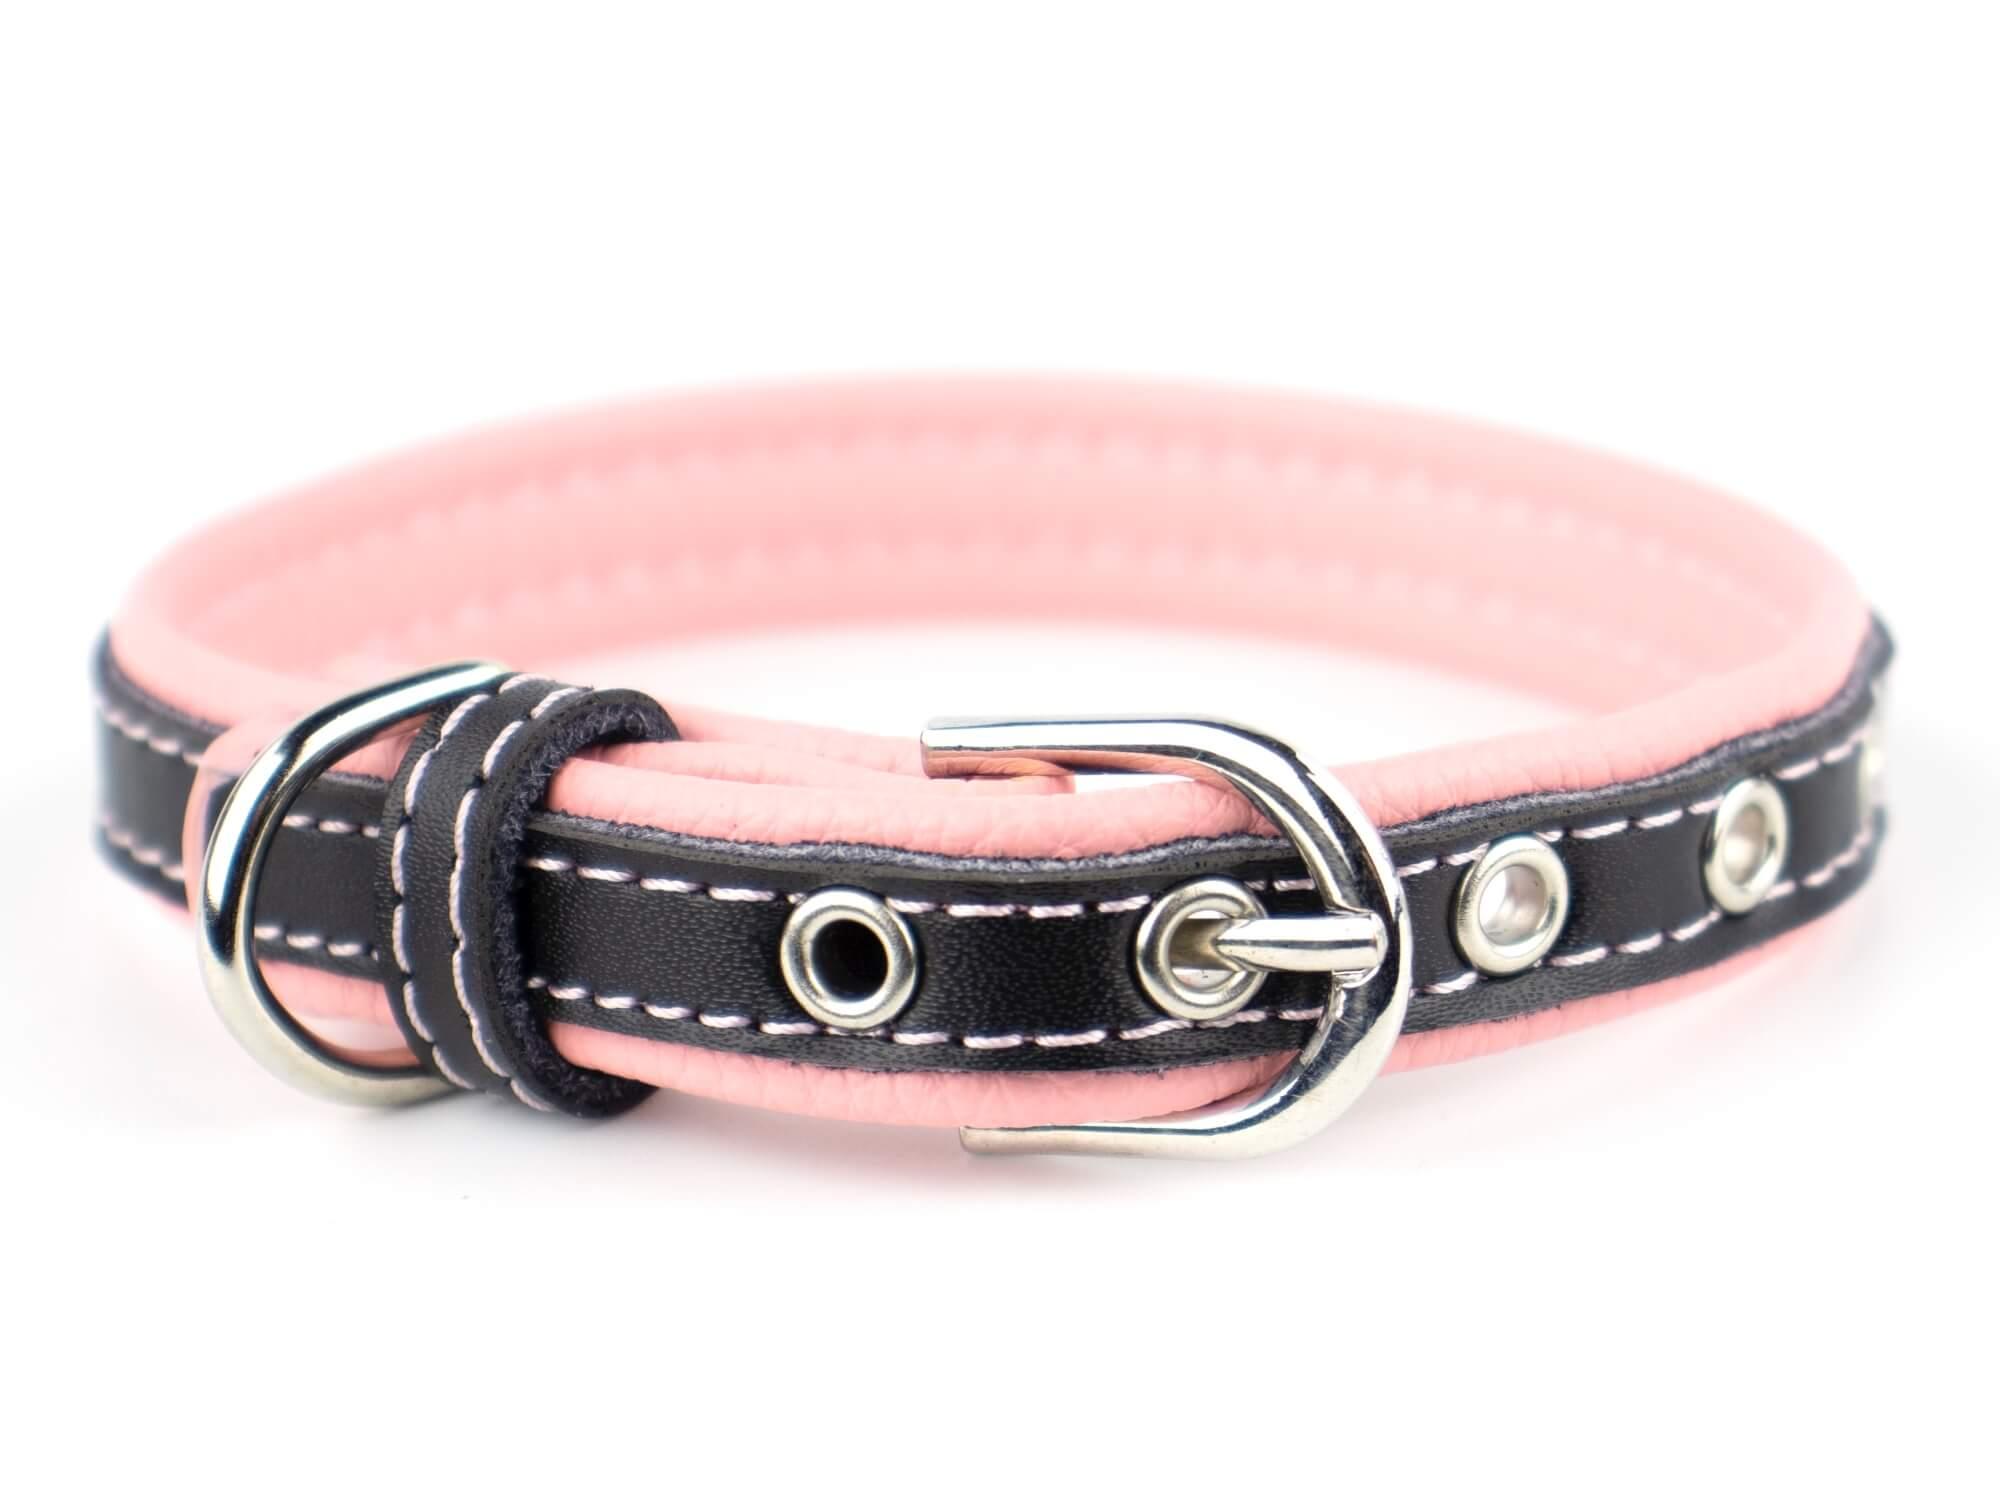 Vsepropejska Rose obojek pro psa | 22 - 34 cm Barva: Růžovo-černá, Obvod krku: 27 - 34 cm